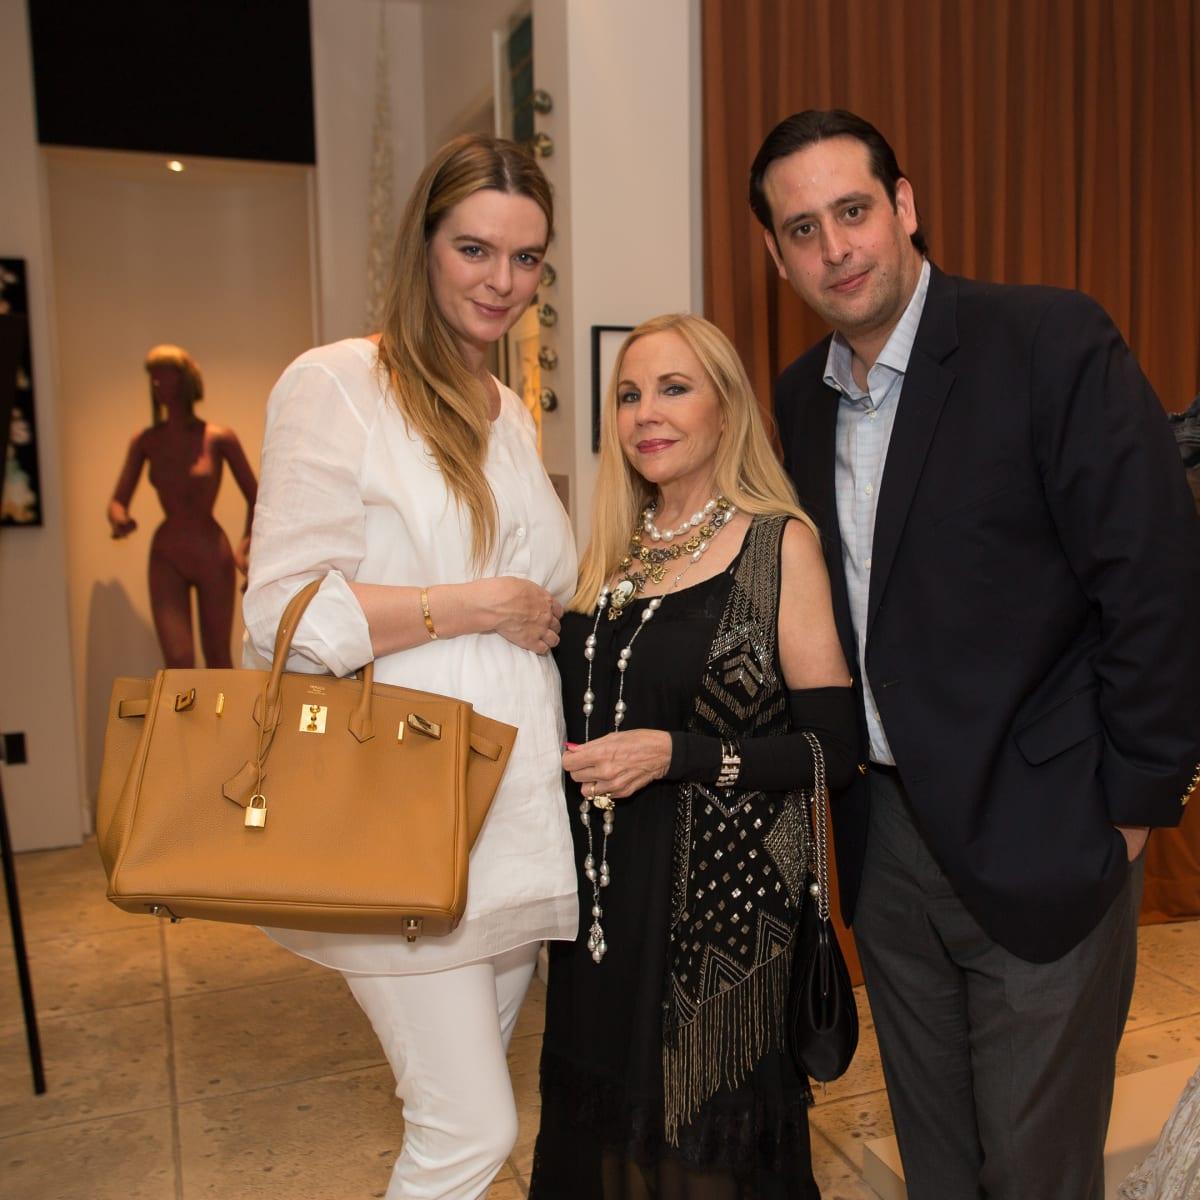 News, Shelby, Fine Art Fair Kick-off, Sept. 2015, Eloise Bauer, Carolyn Farb, Luis Bauer